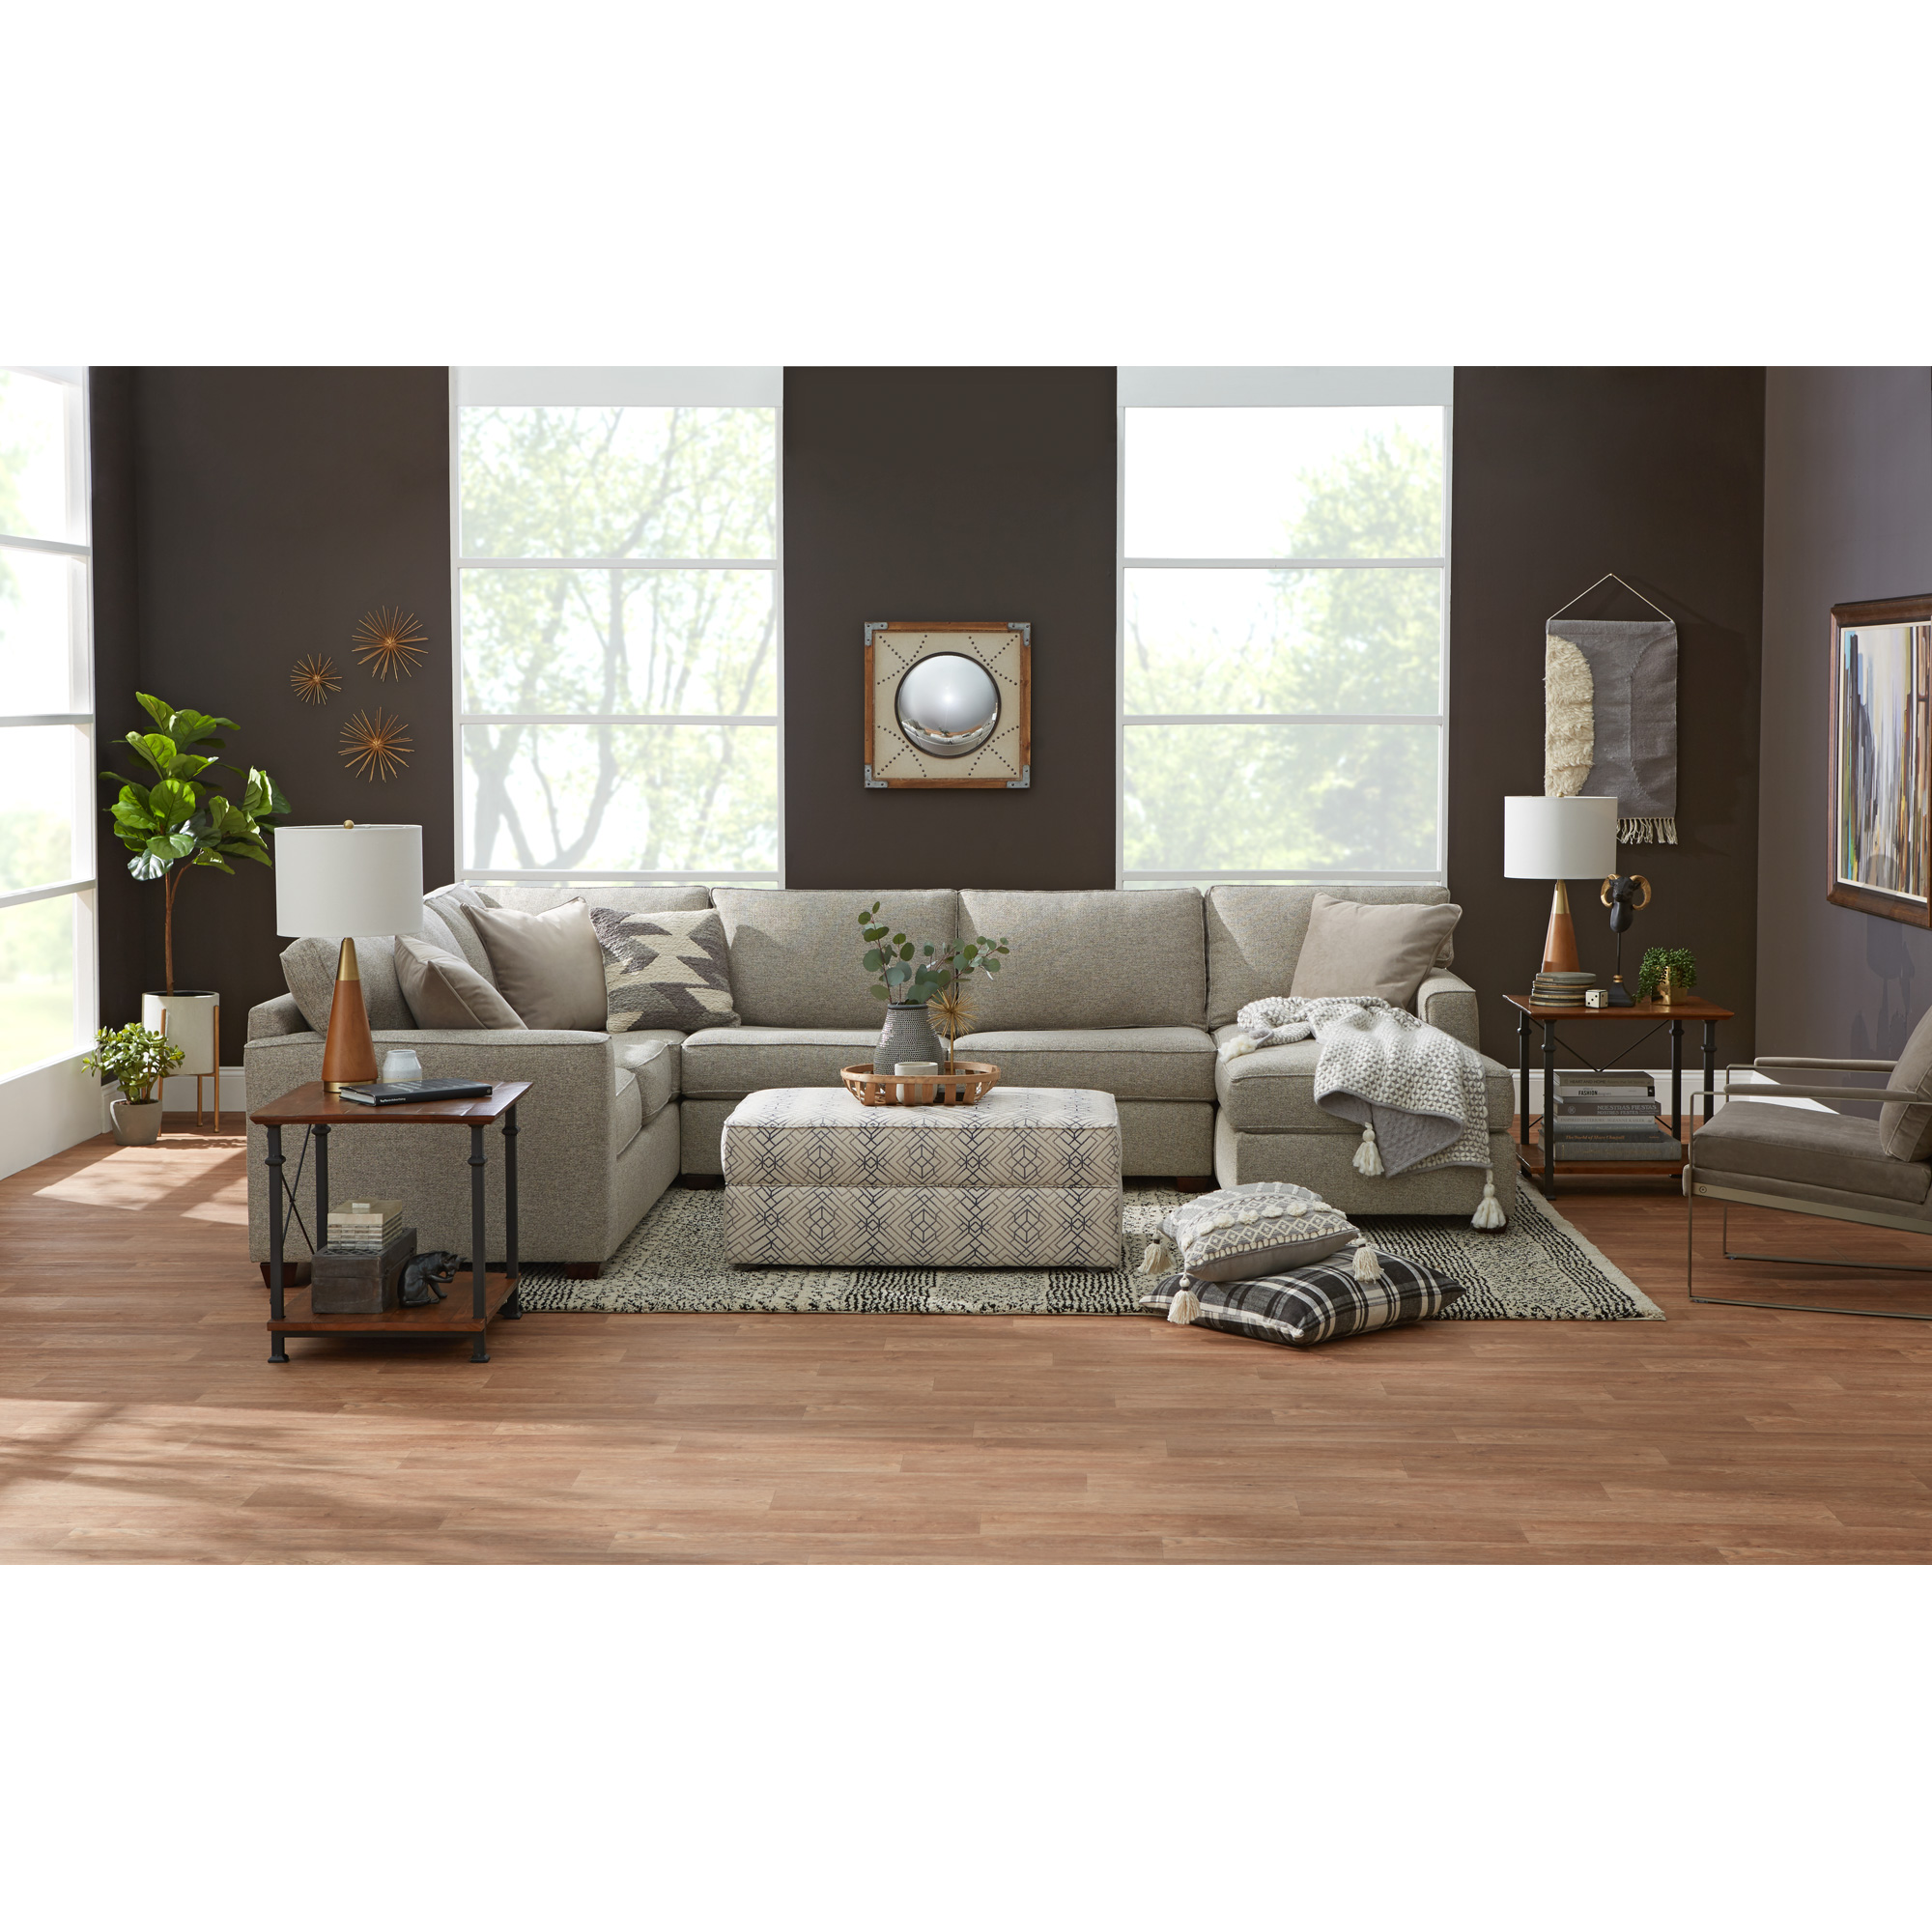 Bauhaus Furniture | Rise Gray 3 Piece Right Sectional Sofa